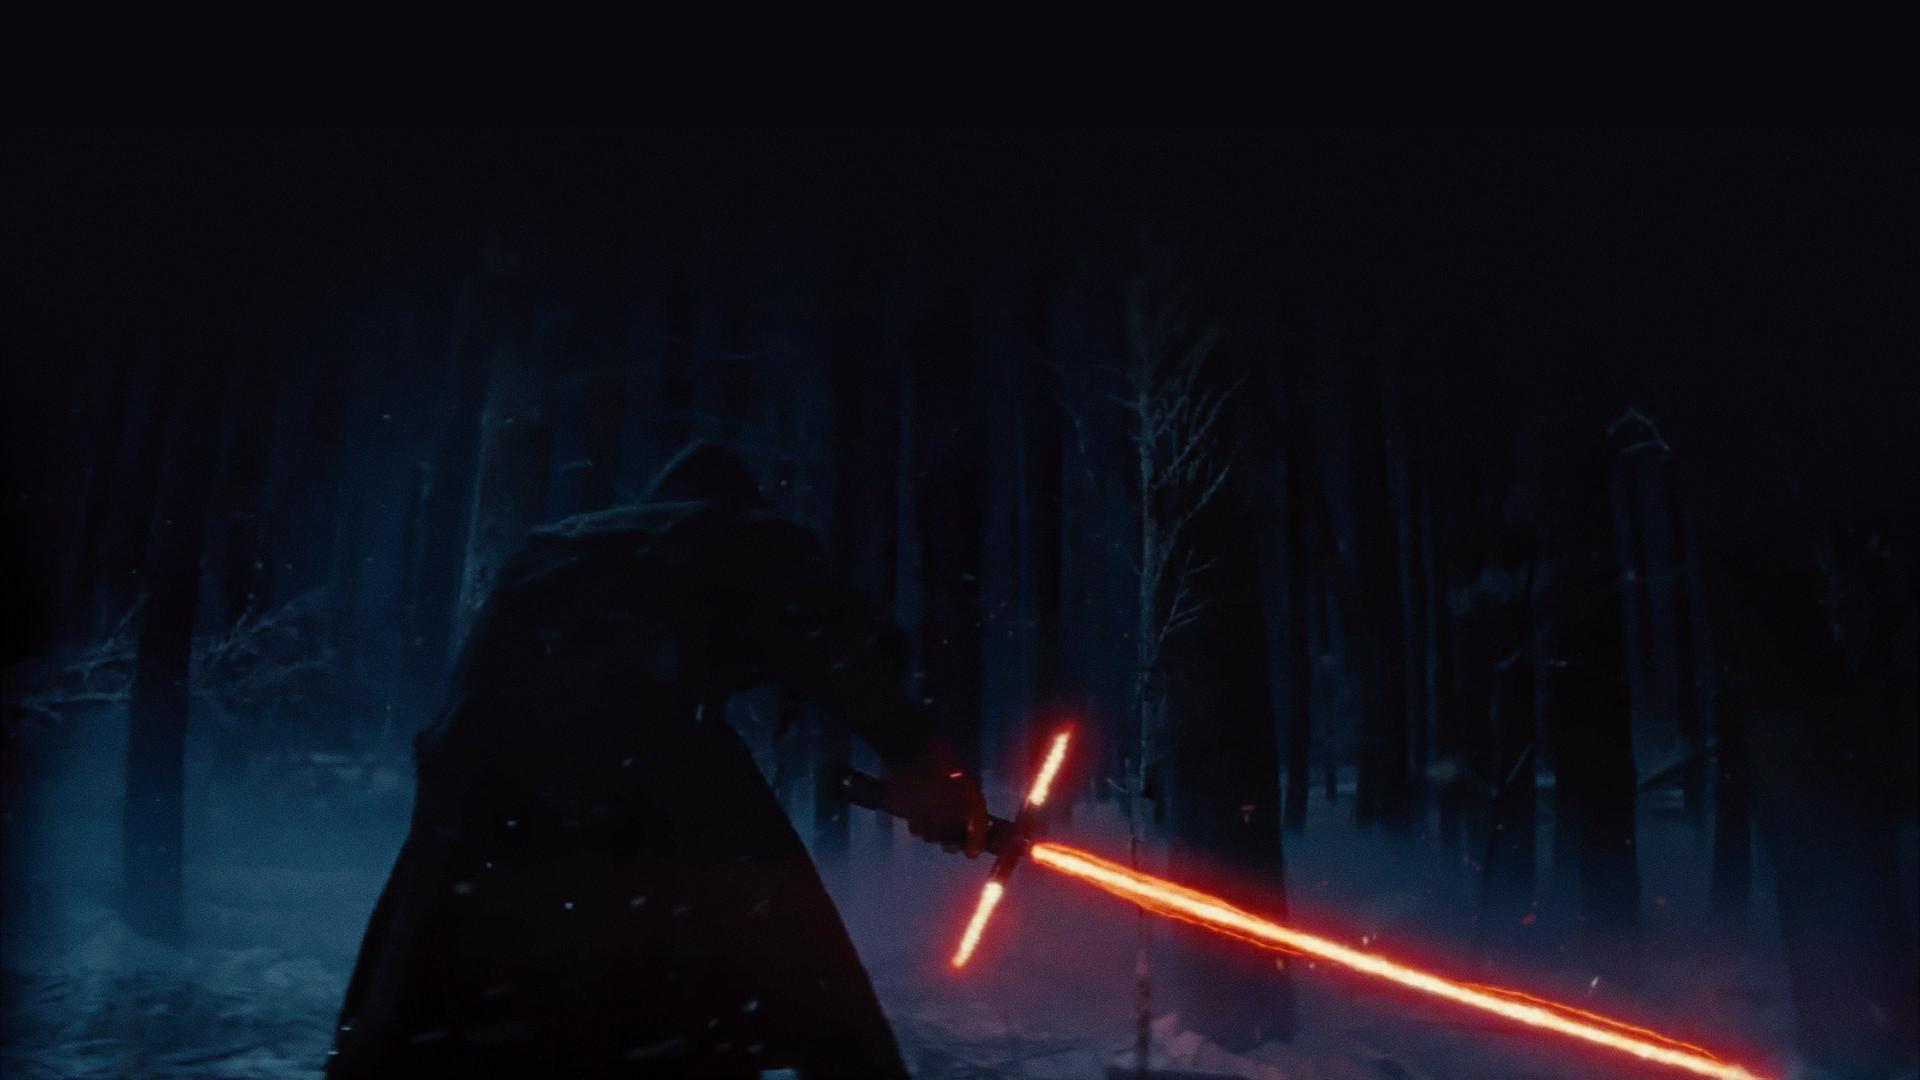 1920x1080 Star Wars The Force Awakens Desktop Wallpapers